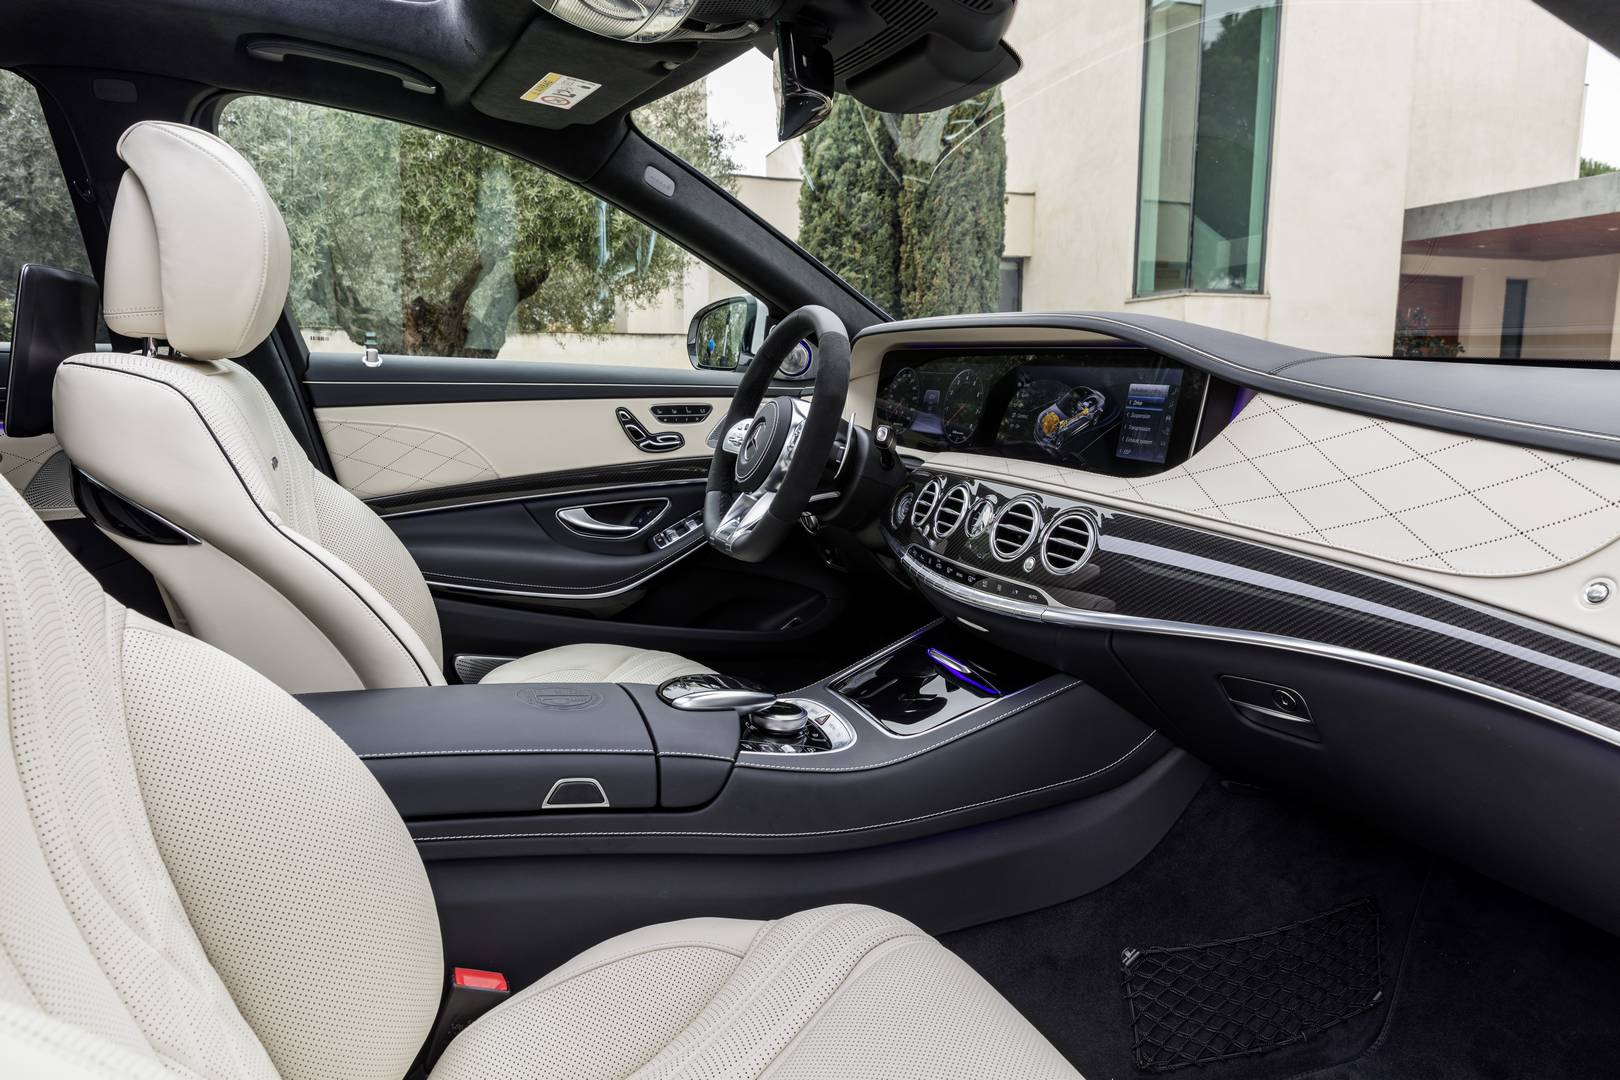 2017 Mercedes Benz S550 Sedan >> Official: 2018 Mercedes-AMG S63 and S65 Facelift - GTspirit